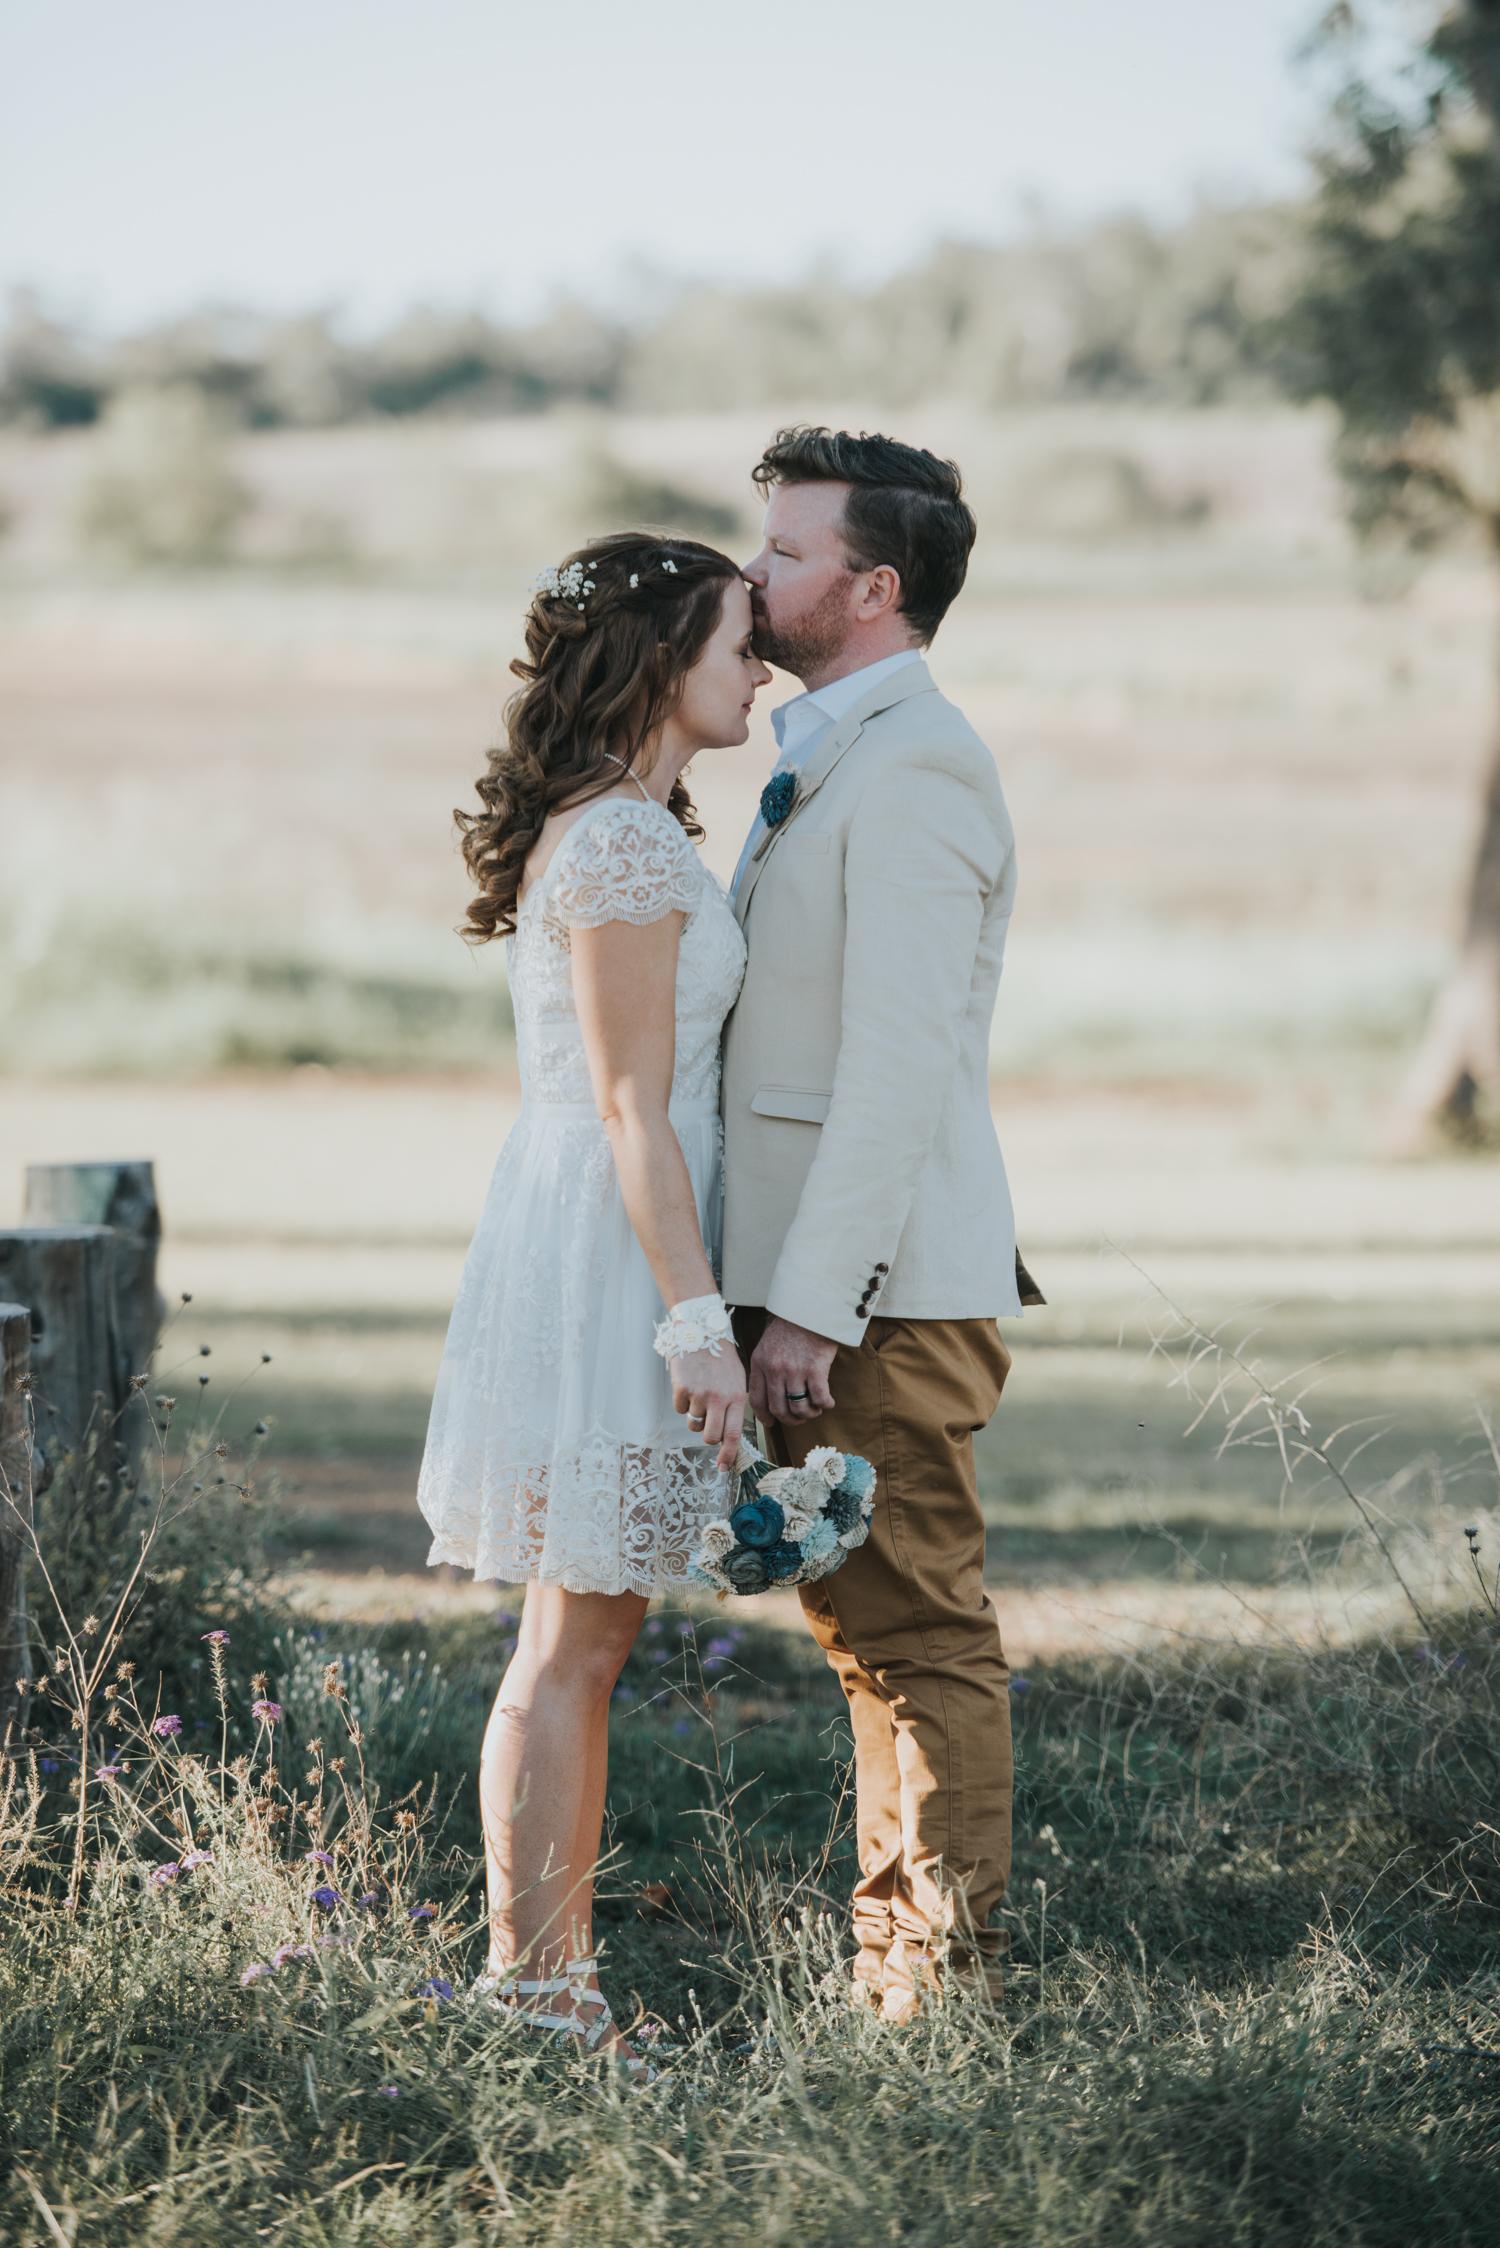 Brisbane Wedding Photographer | Engagement Photography-46.jpg